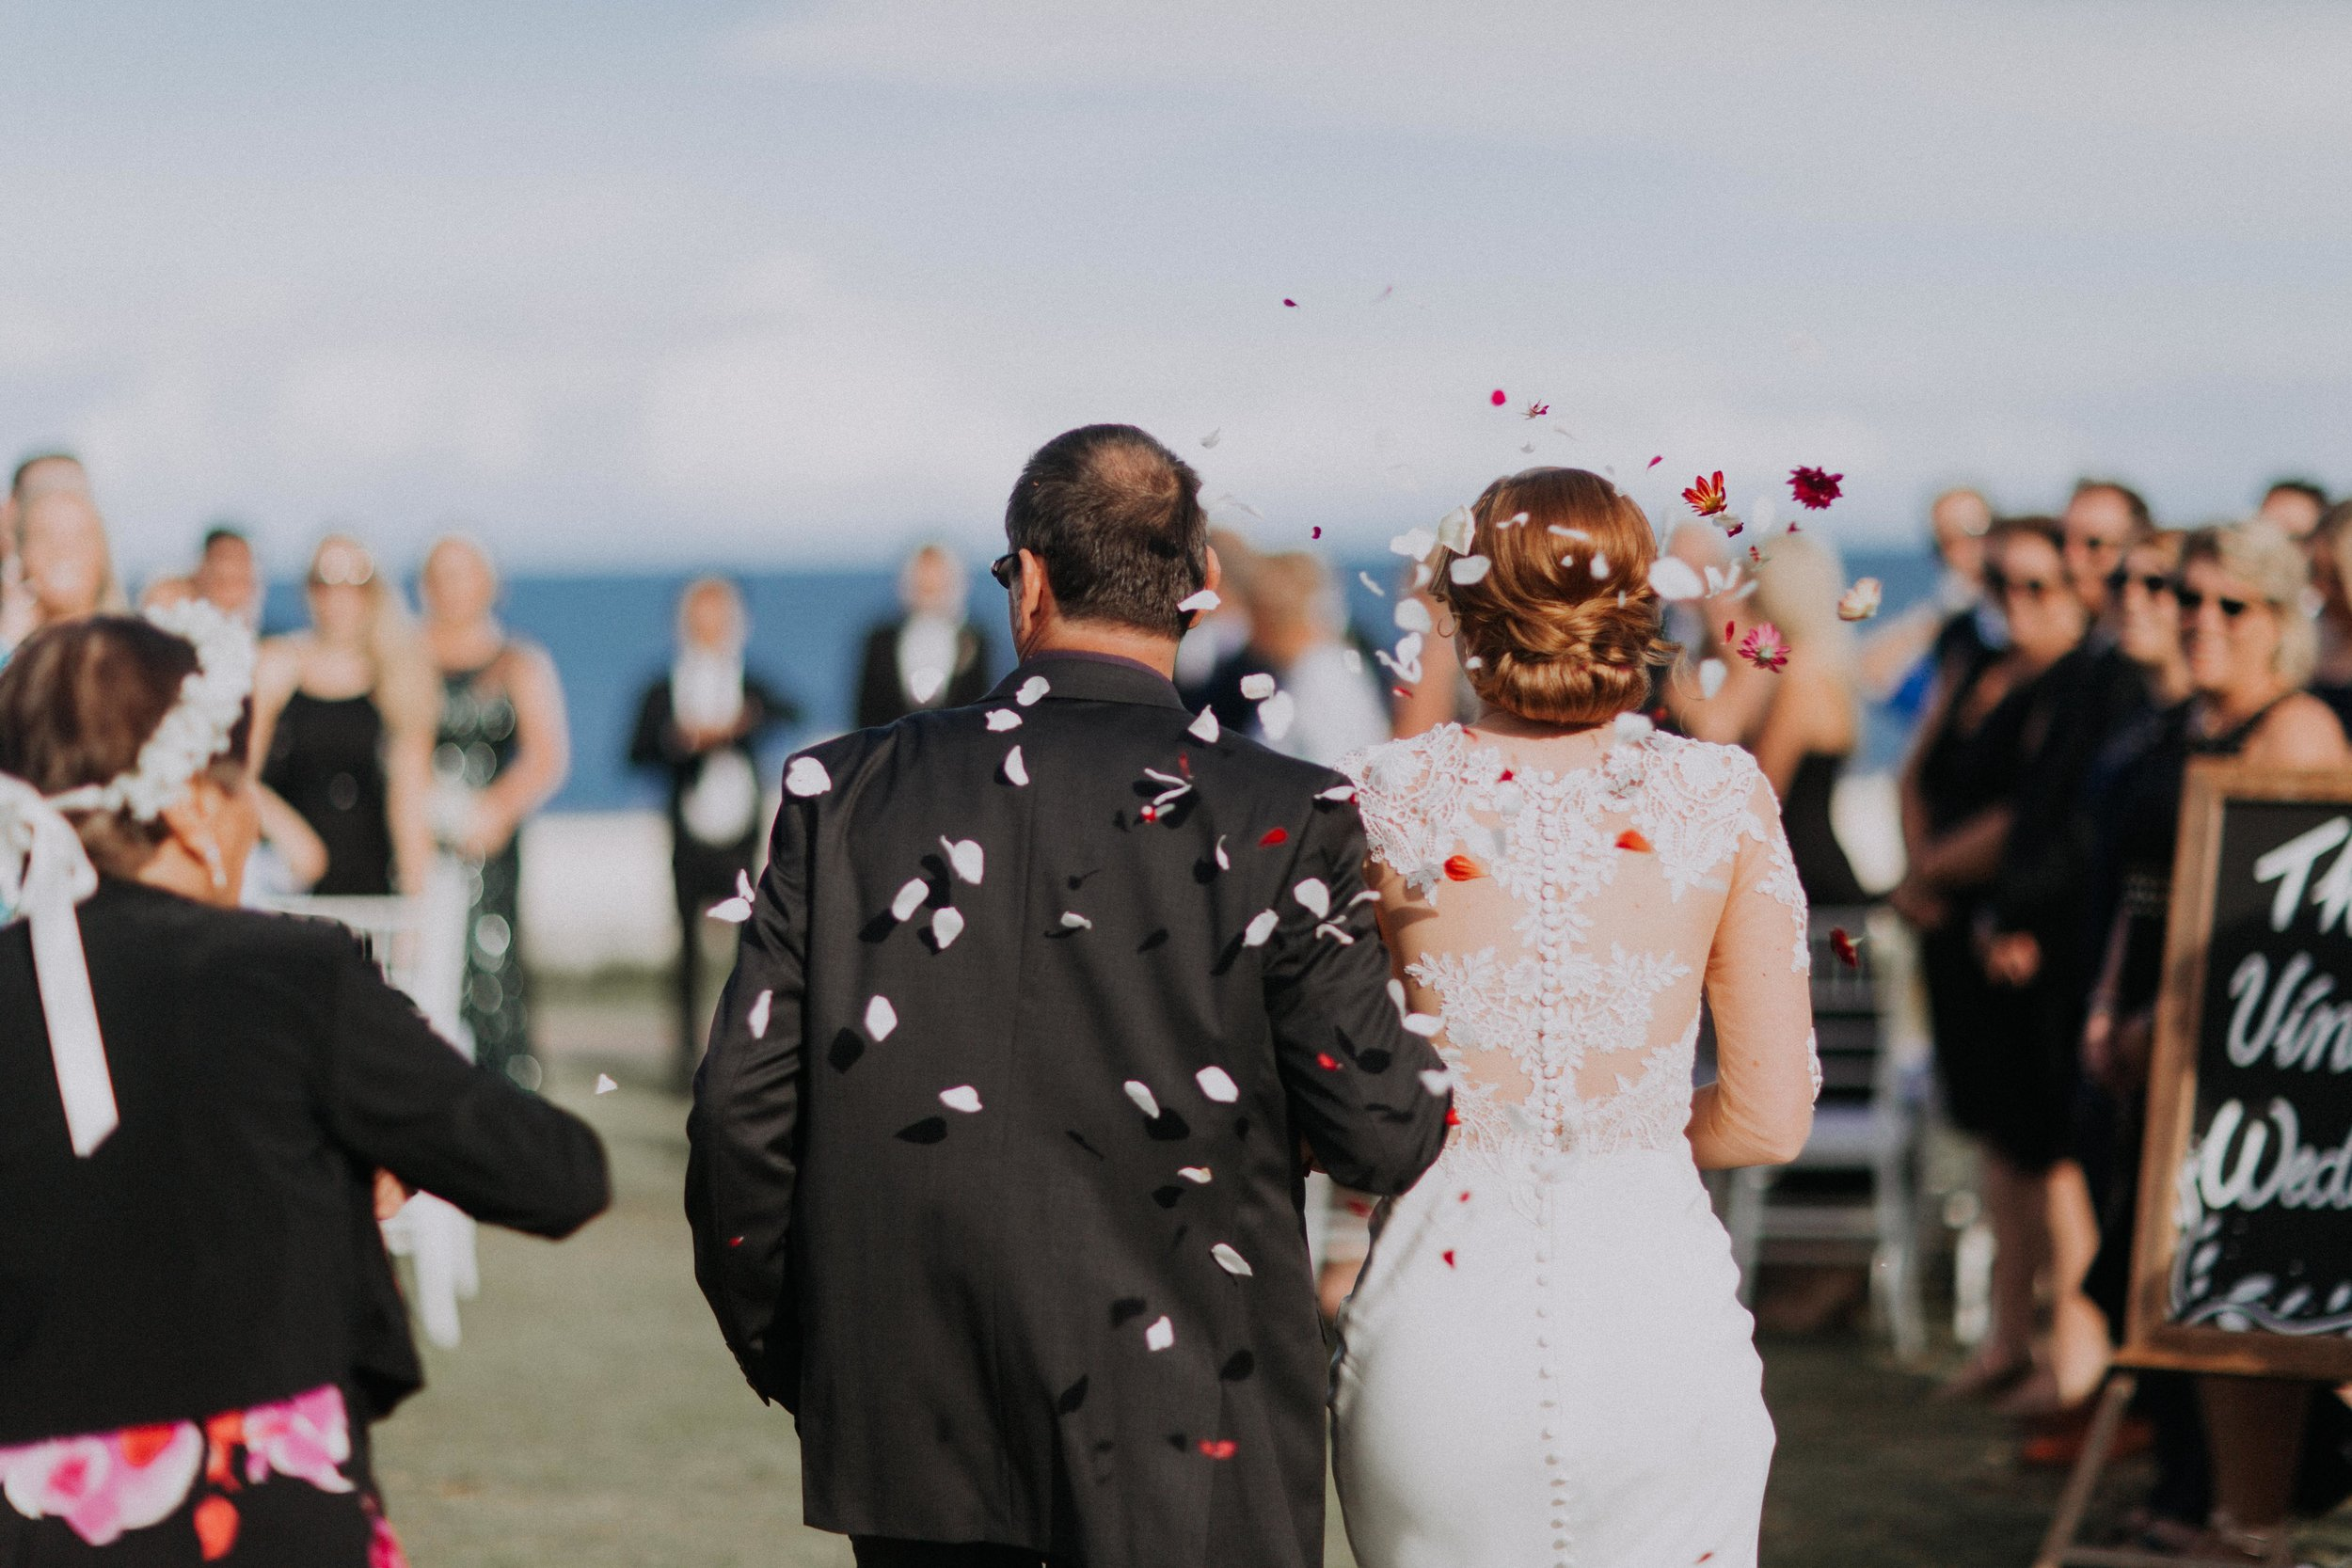 Monique + Nick Vincent - Wedding Photos FINALS-18.jpg